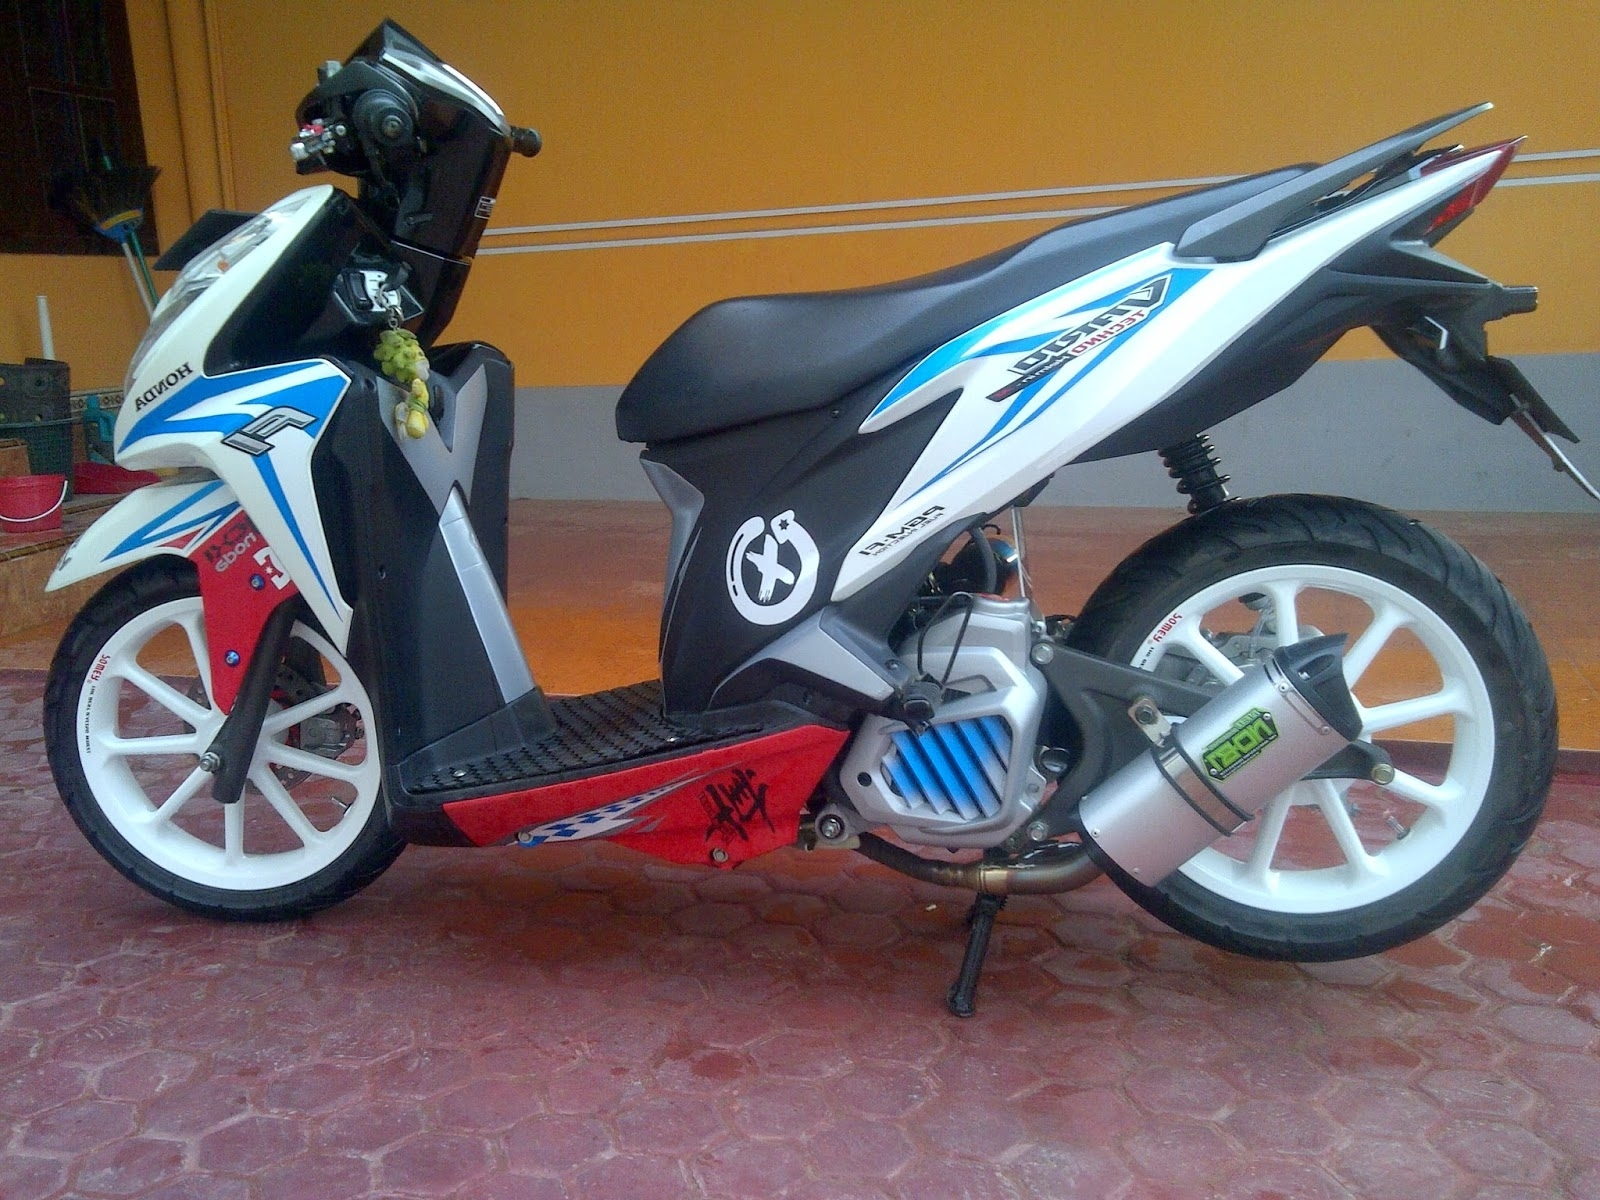 Modifikasi Motor Honda Vario 125 Kumpulan Modifikasi Motor Scoopy